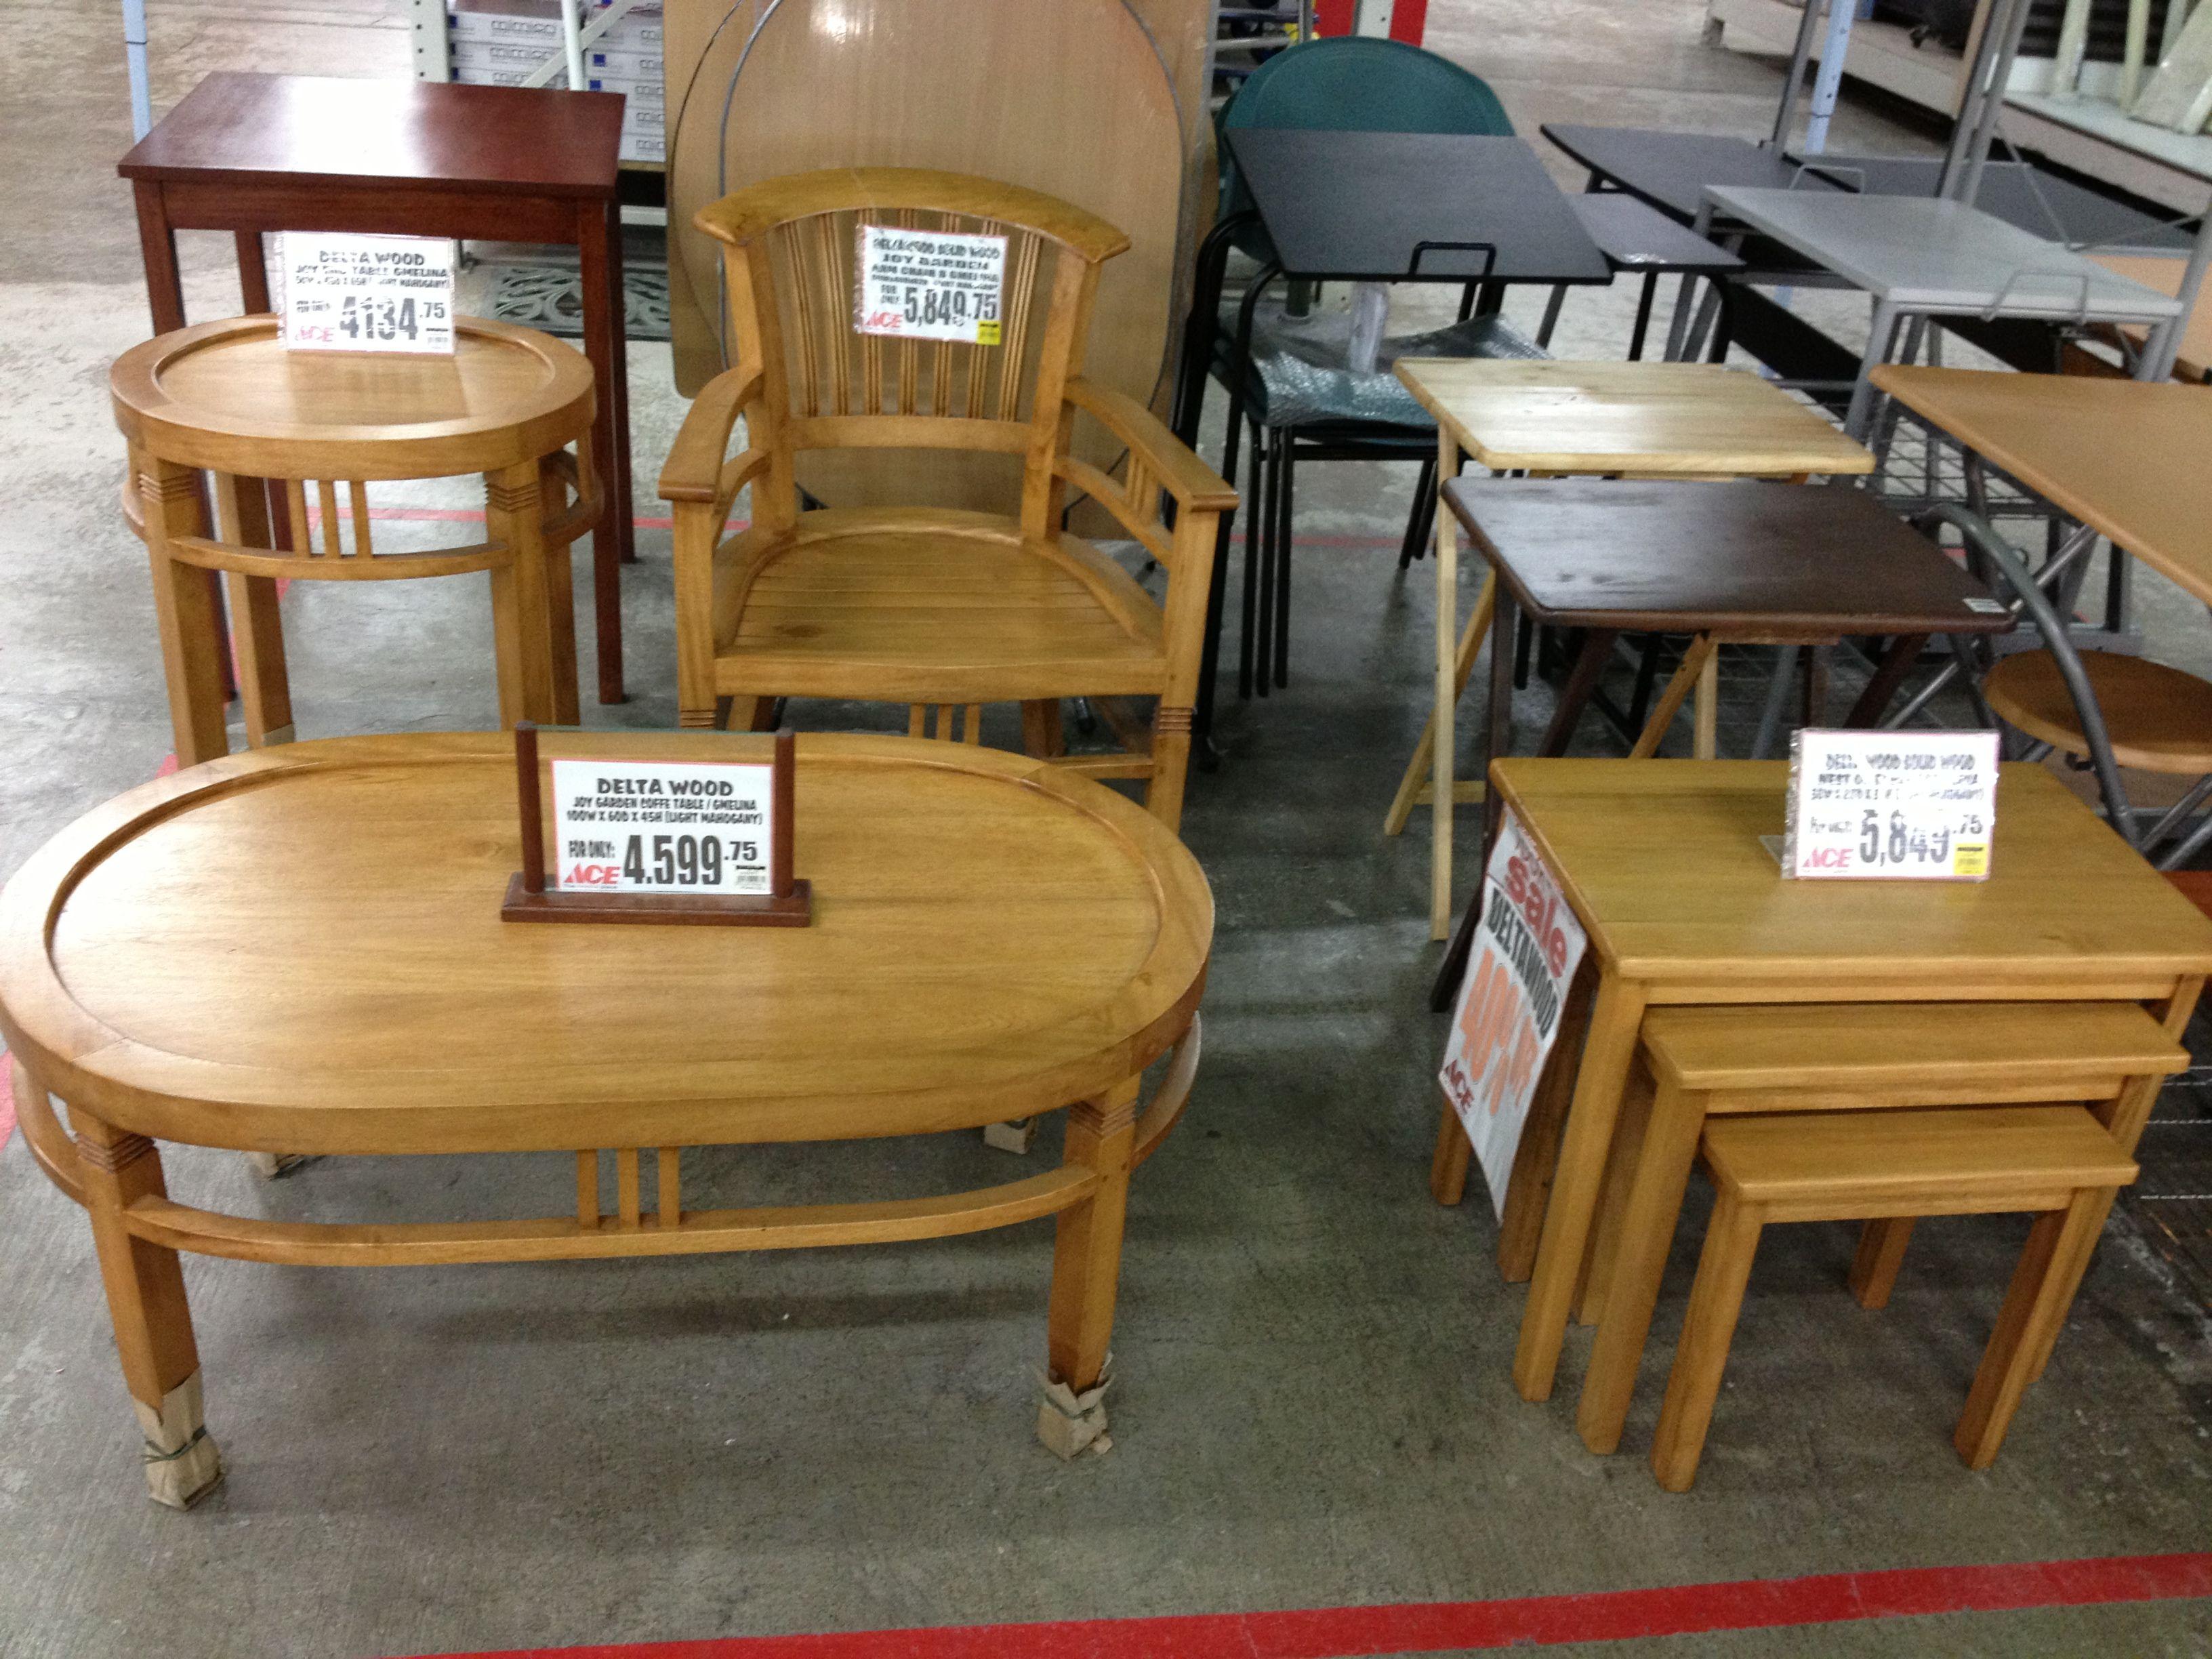 Deltawood furniture @ Ace Hardware   Inspiration Board: 1 BR The ...